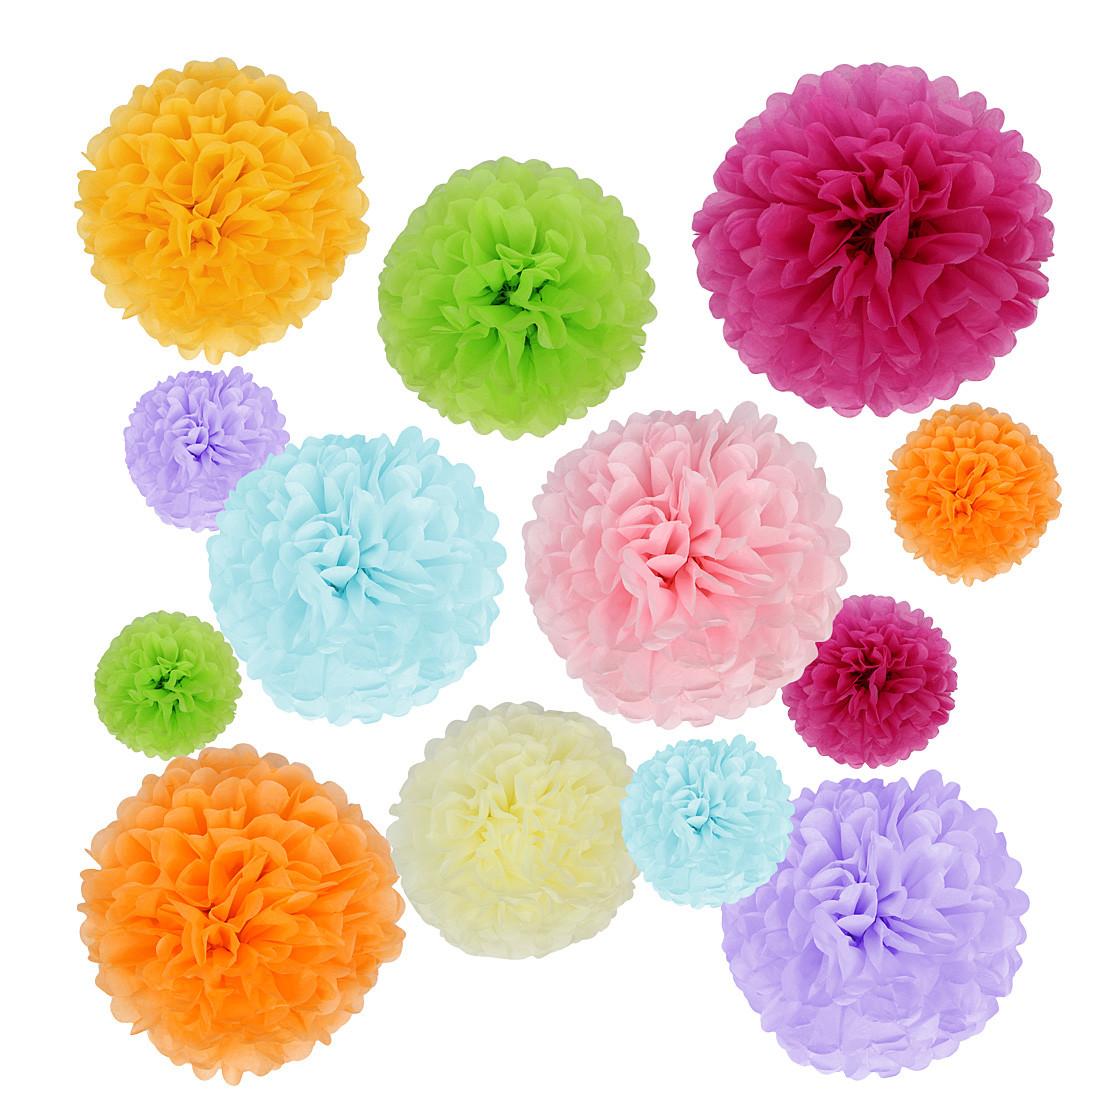 Kilofly 24pc Nice Wedding Crafts Tissue Paper Pom Pom Flower Color